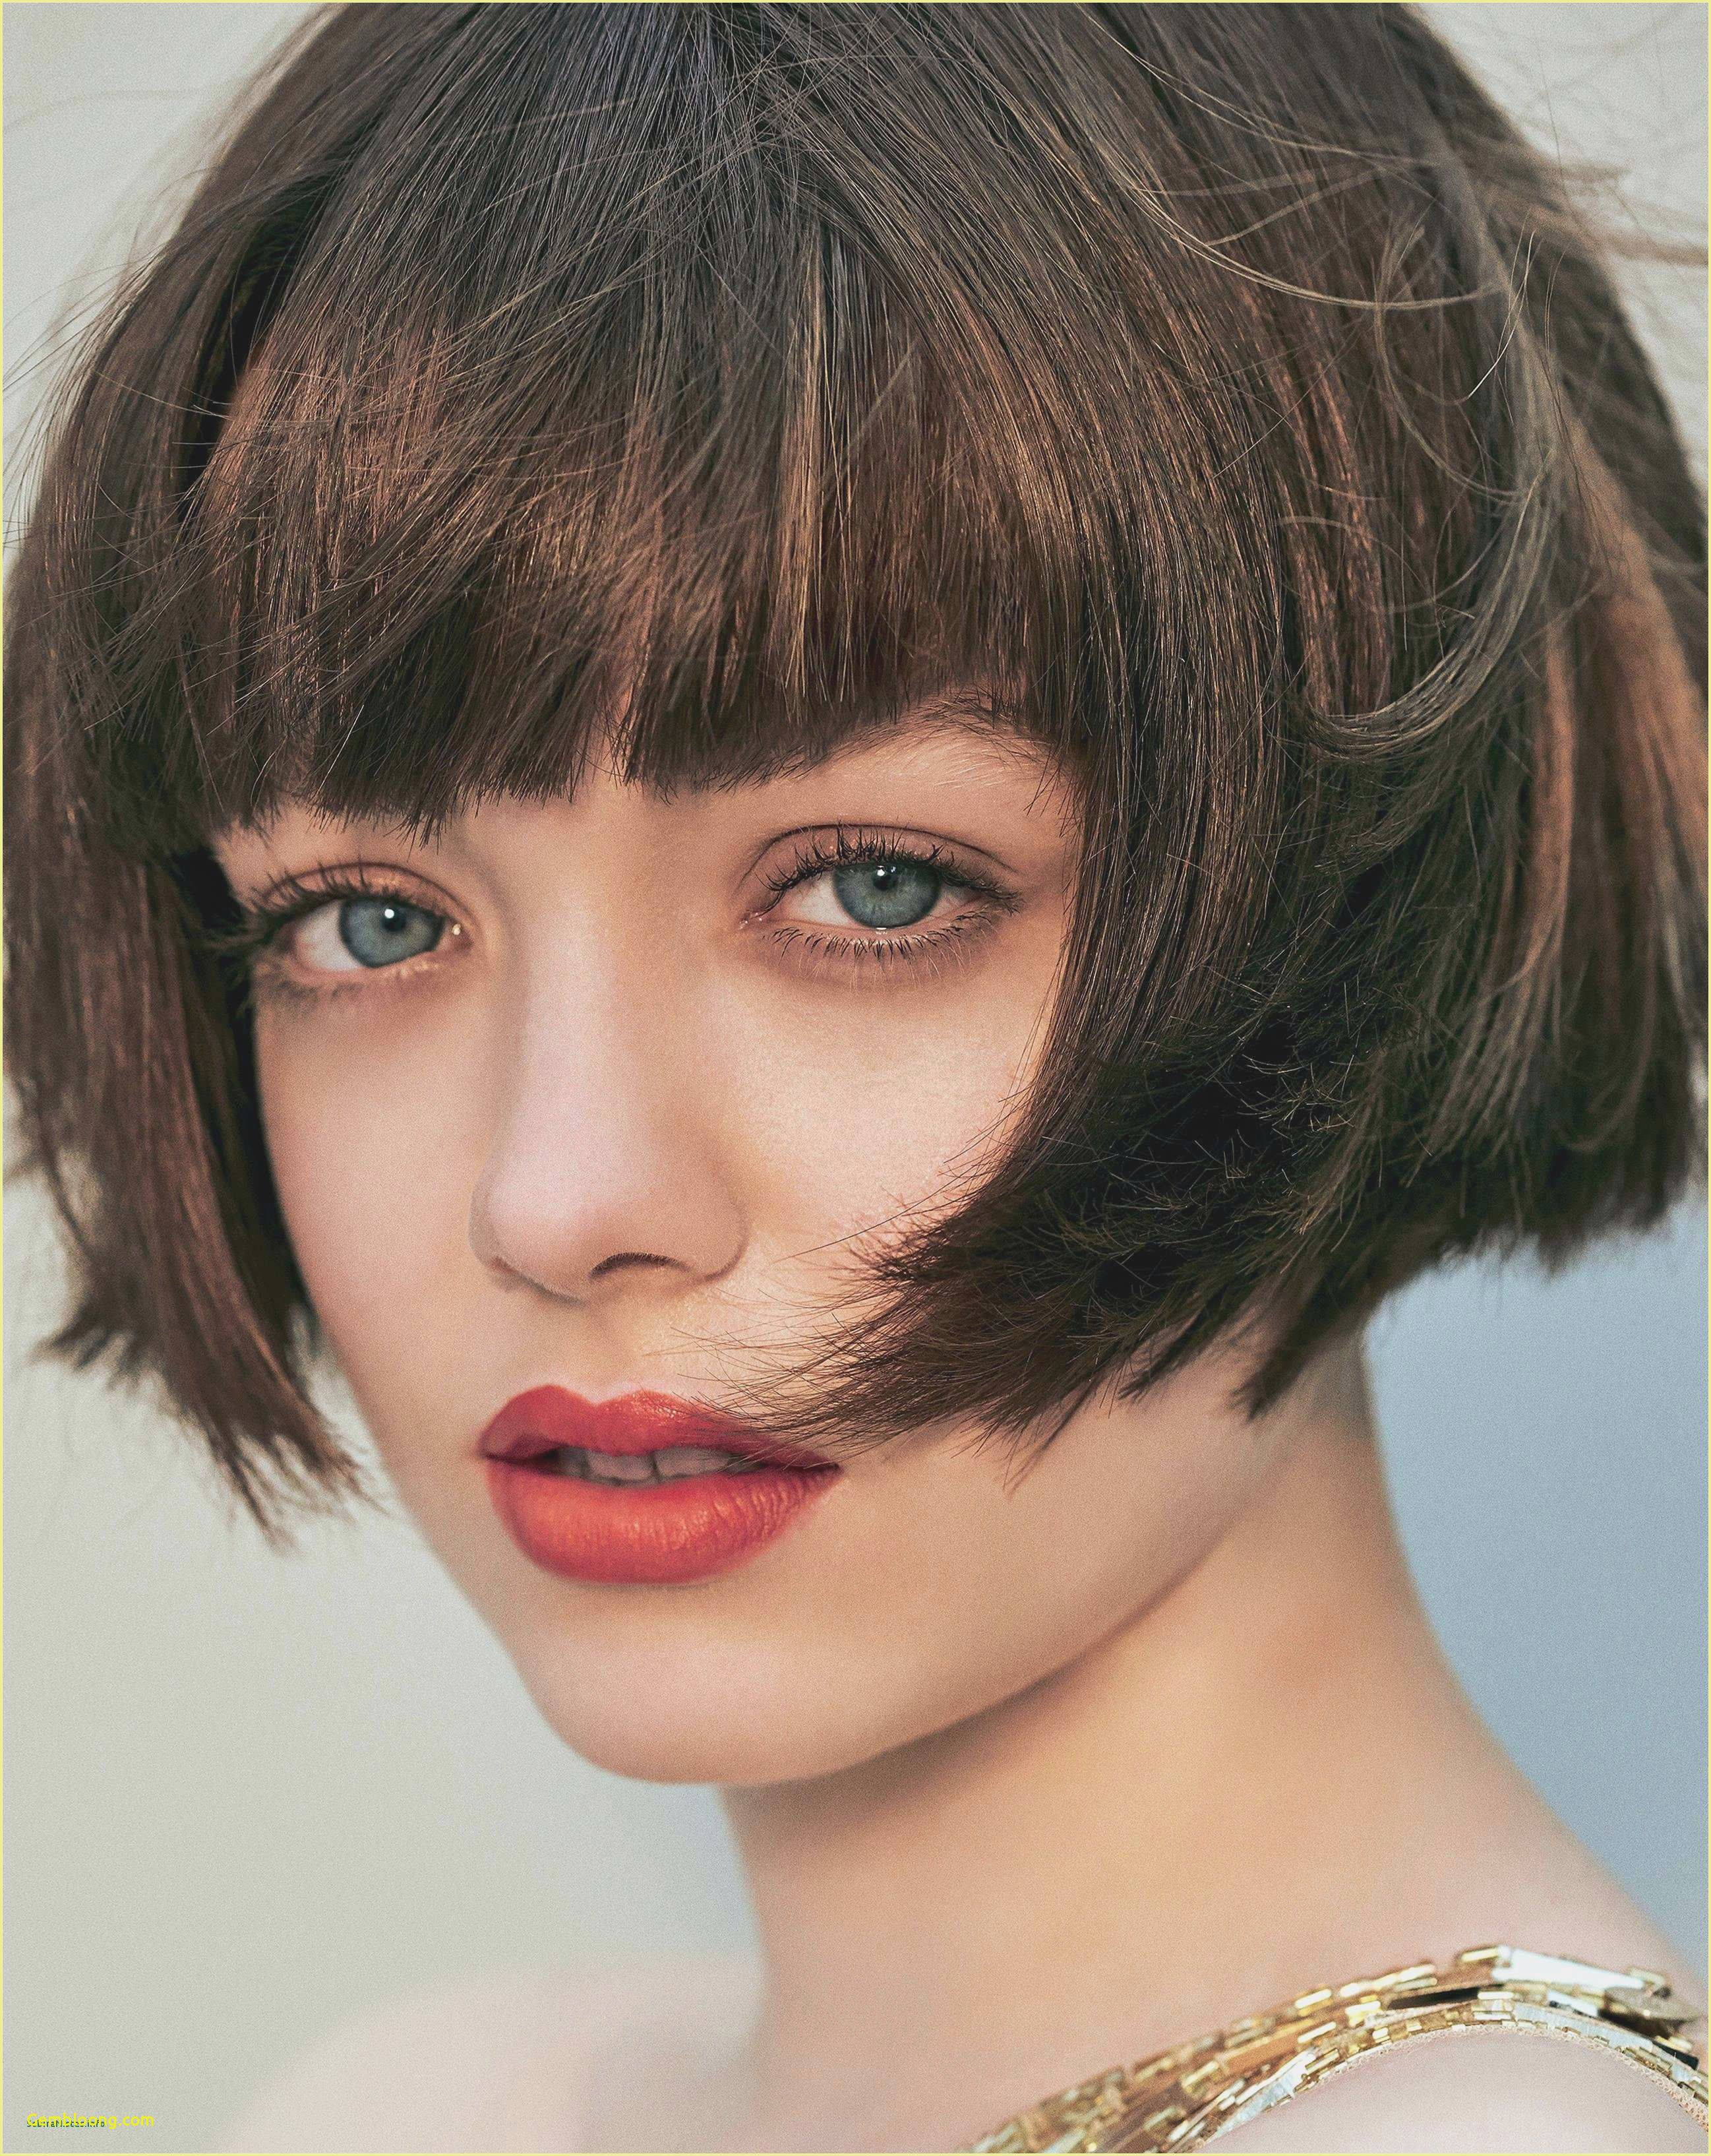 Frisuren Feines Haar Vorher Nachher Potongan Rambut Pendek Rambut Dan Kecantikan Dan Rambut Pendek